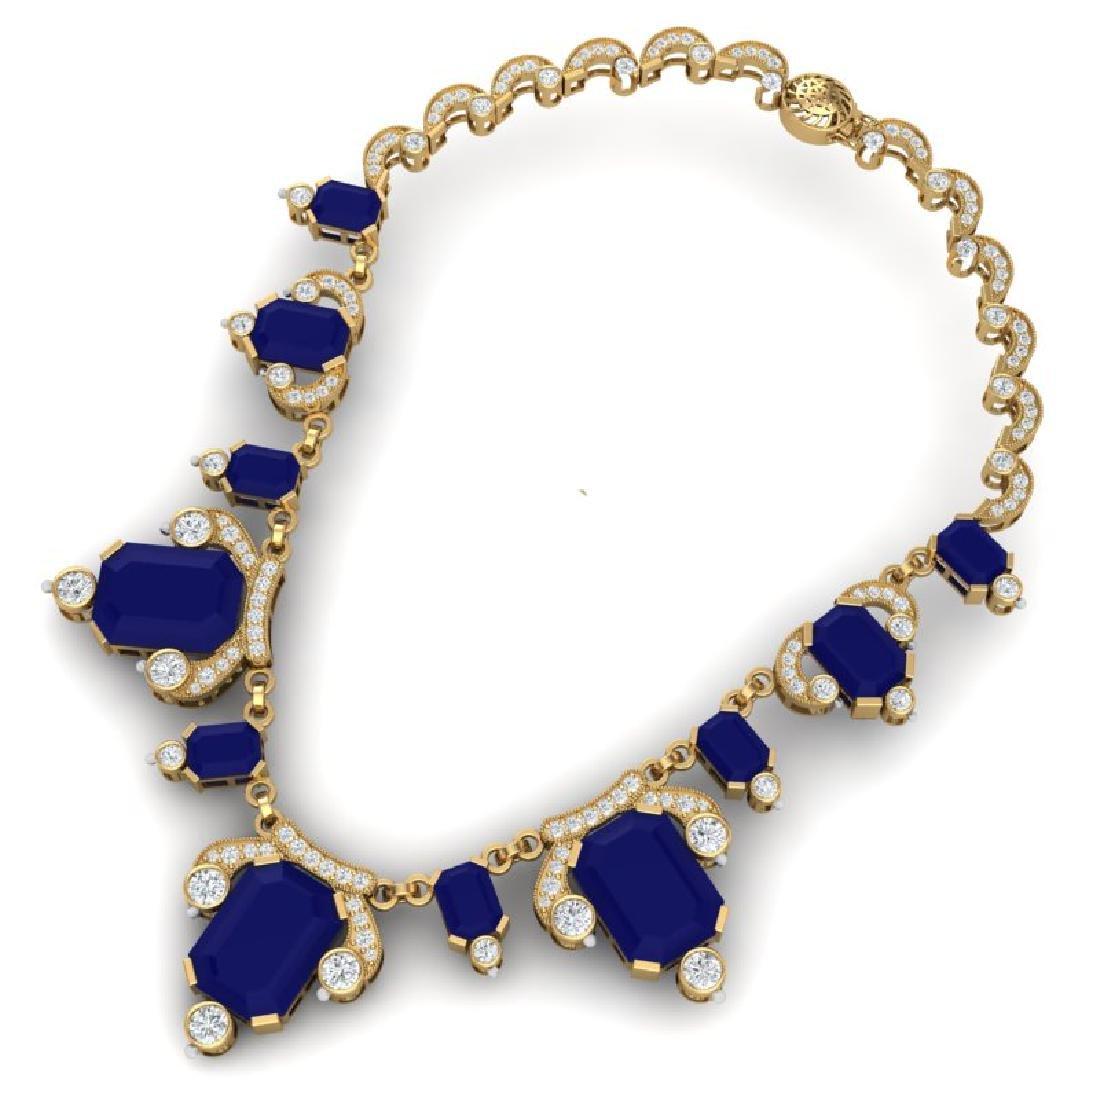 75.21 CTW Royalty Sapphire & VS Diamond Necklace 18K - 3